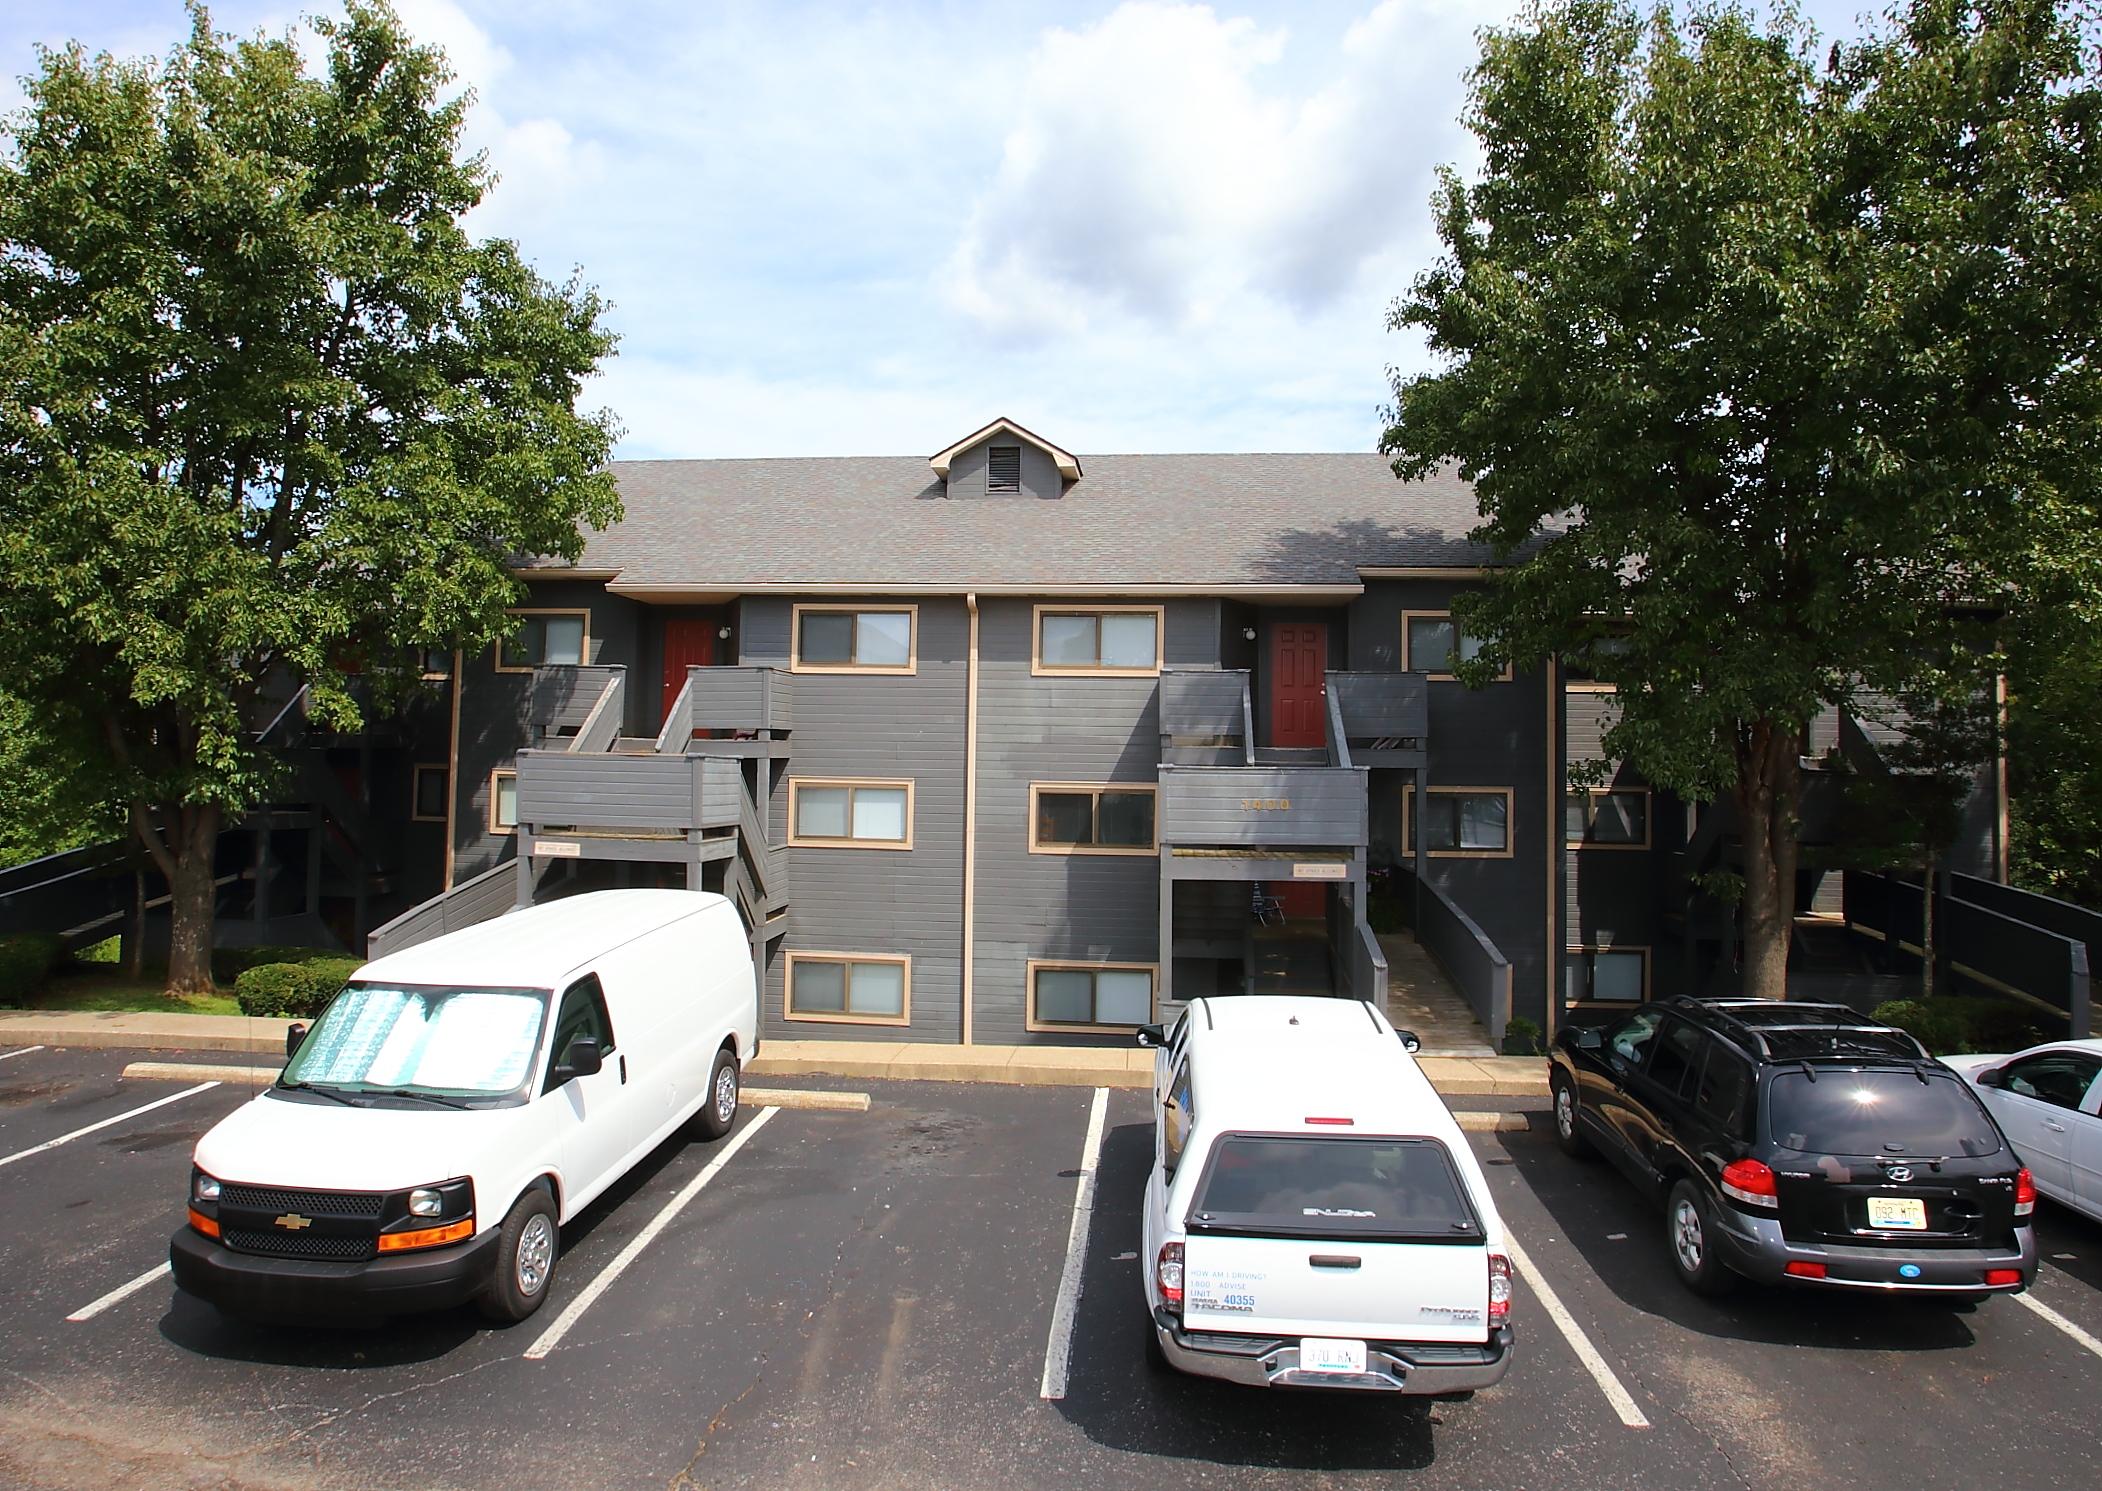 For rent: 1400 Pine Valley Dr, Elizabethtown, KY 42701 ...